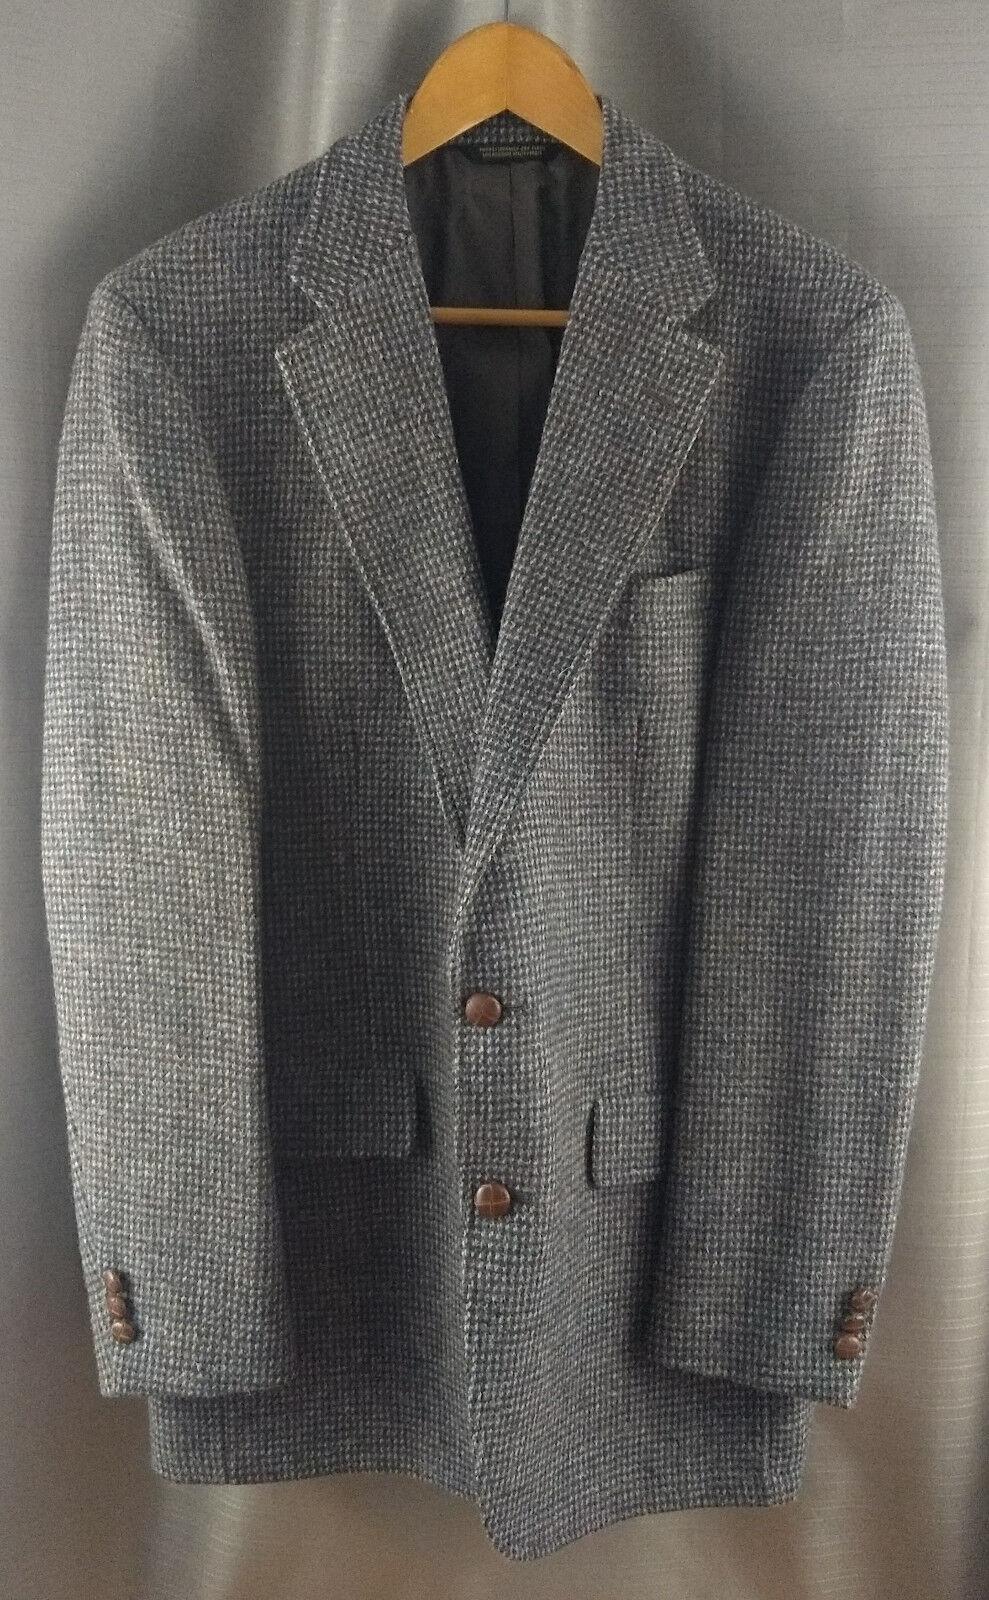 Vintage Palm Beach Tweed Wool Sport Coat Goudchaux Maison whitehe Lined USA